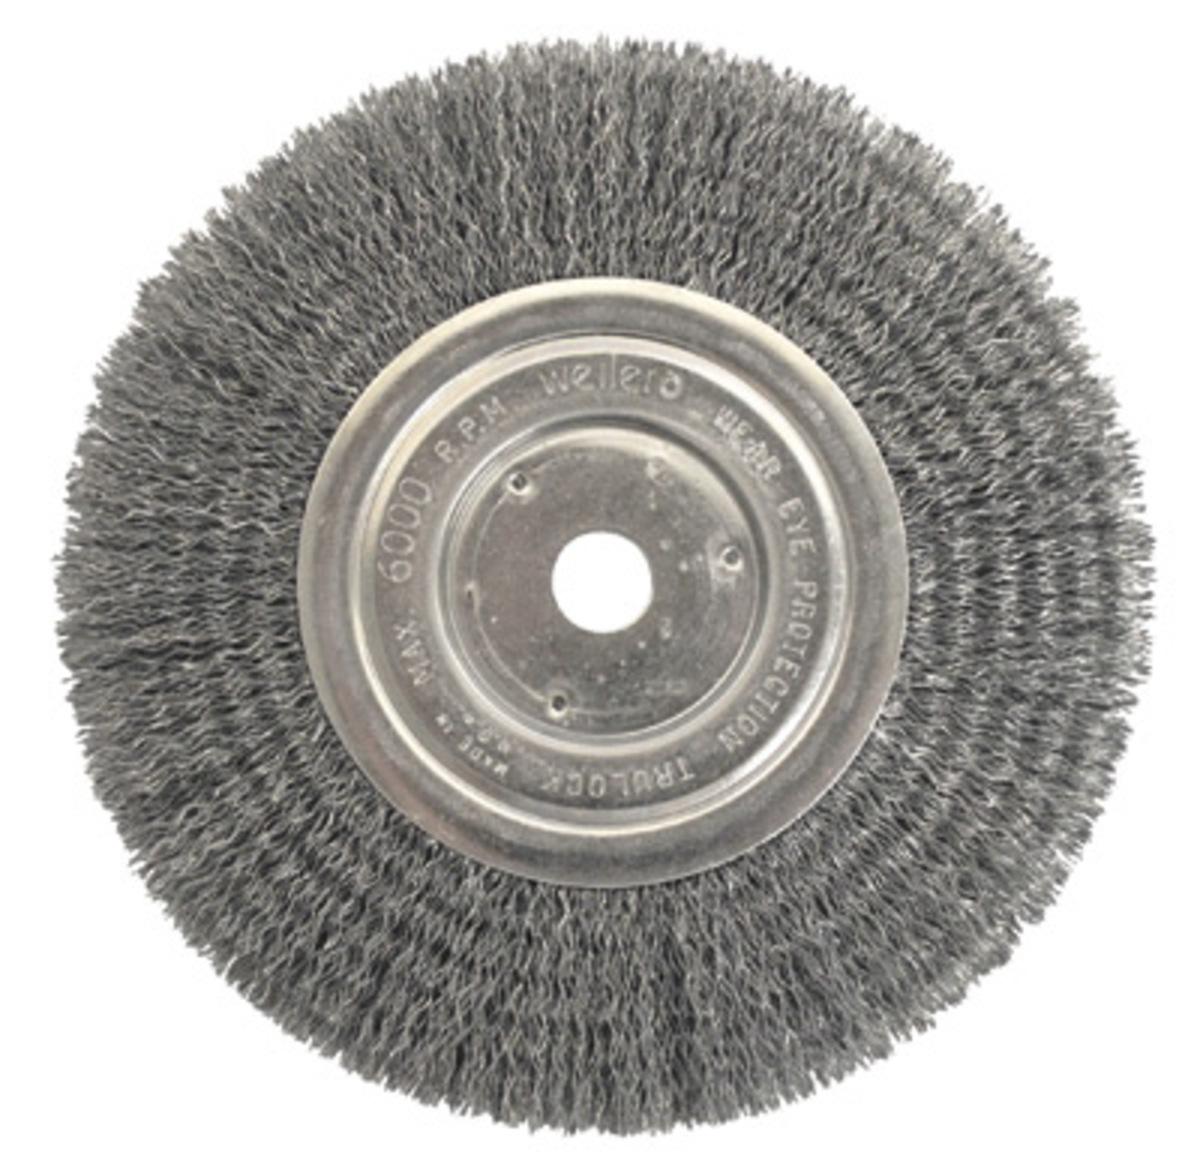 Medium Carbon Steel Wire : Airgas wbu weiler quot trulock™ vortec pro